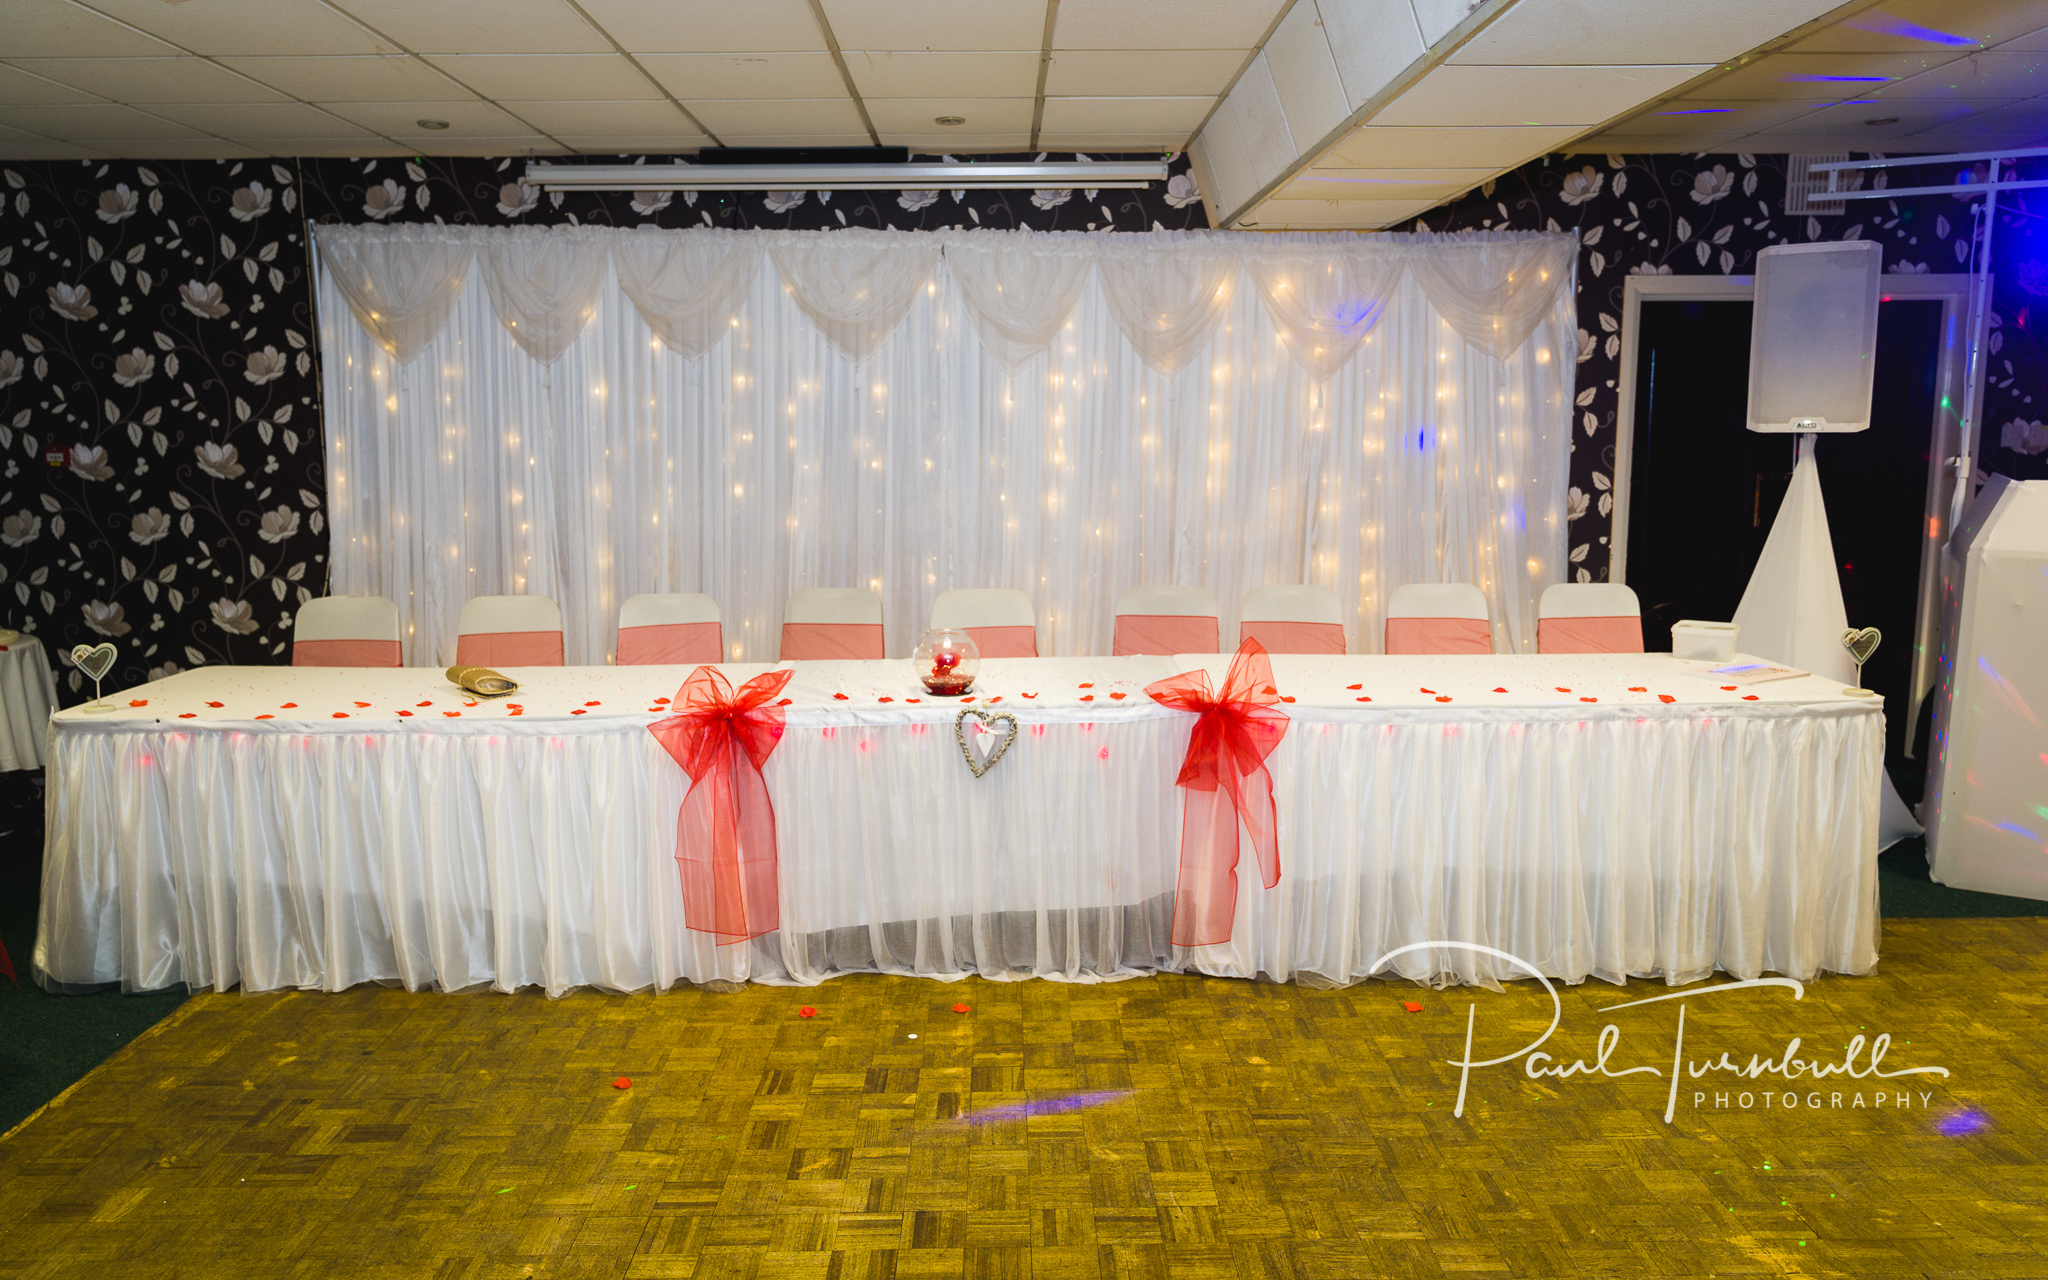 wedding-photographer-leeds-town-hall-031.jpg